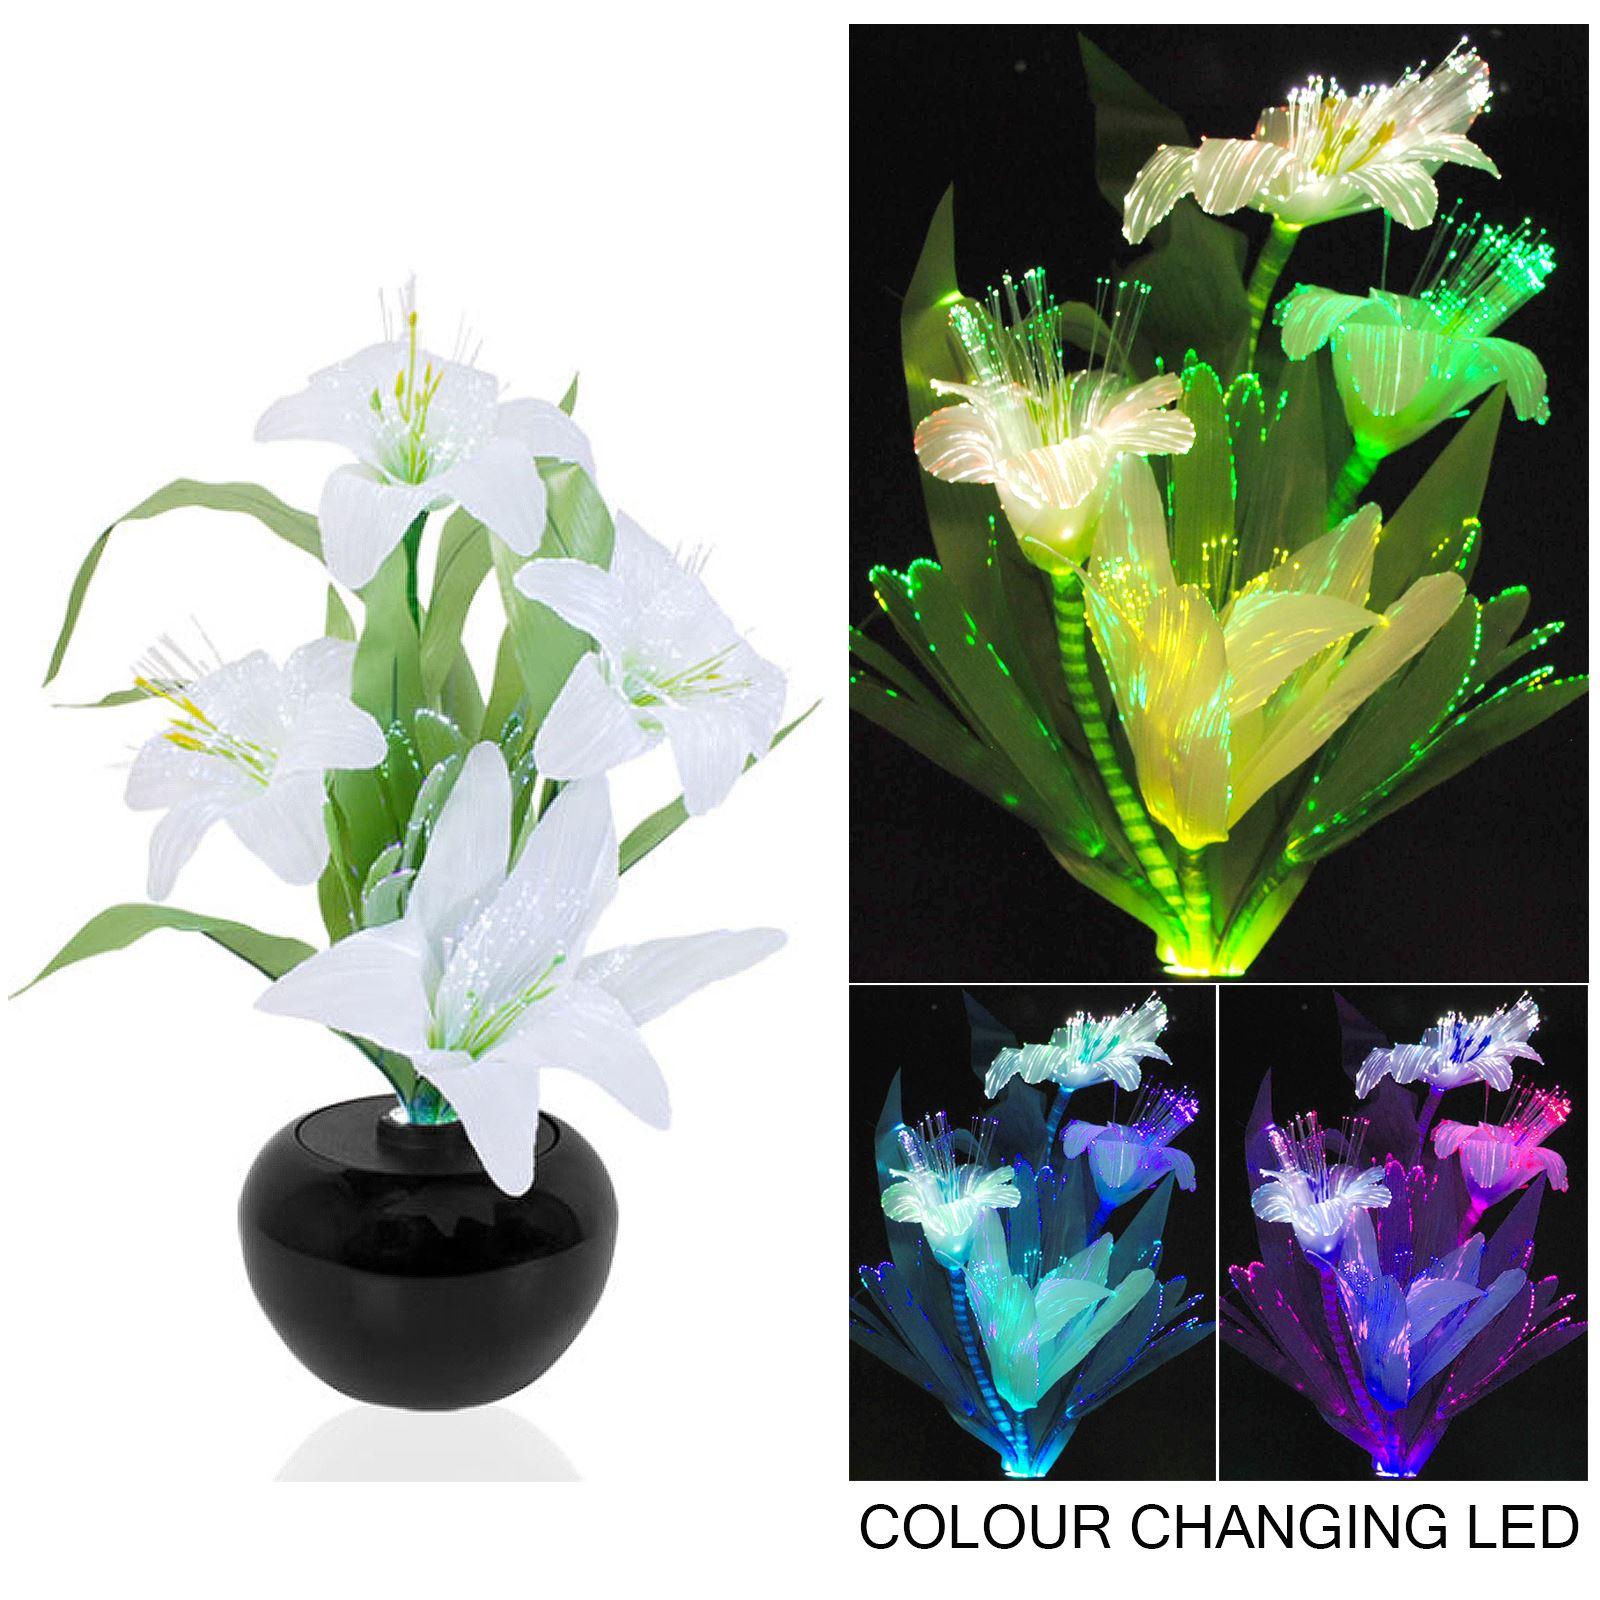 Rgb colour changing led fibre optic flower vase display table lamp rgb colour changing led fibre optic flower vase reviewsmspy